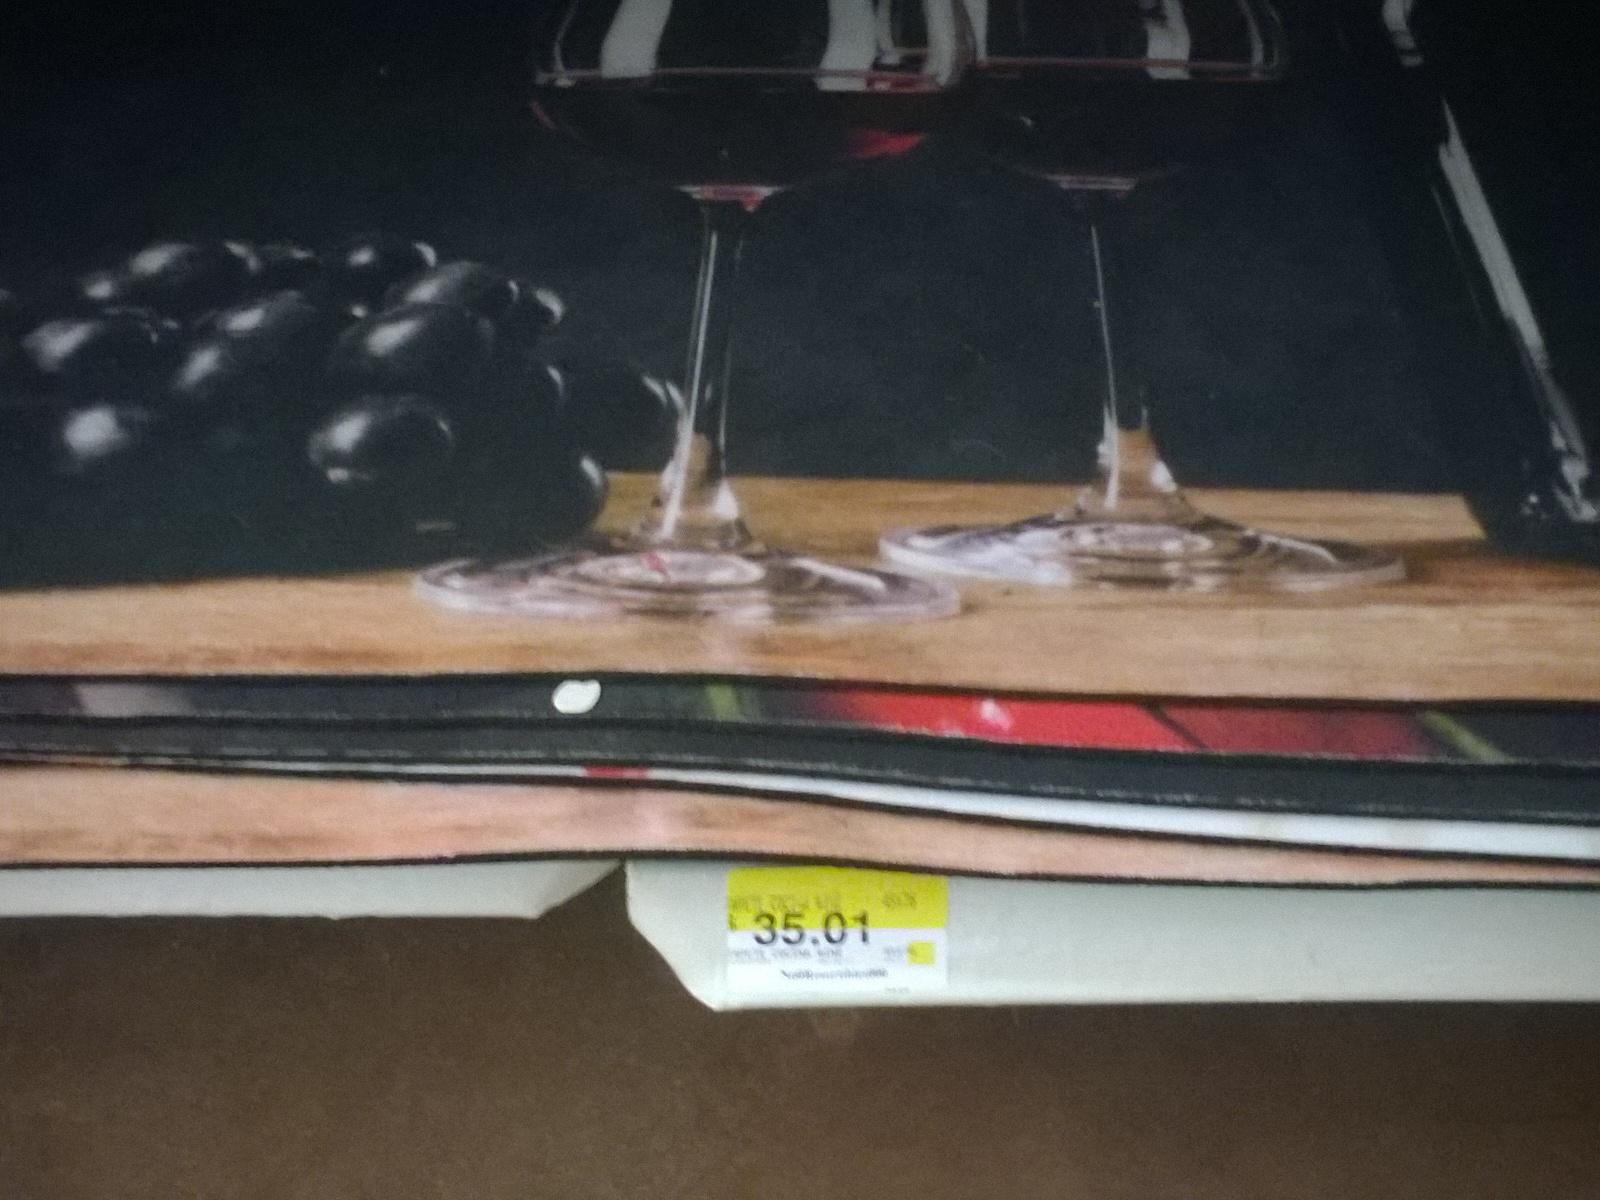 Walmart Villahermosa: Tapete para cocina a $35.01